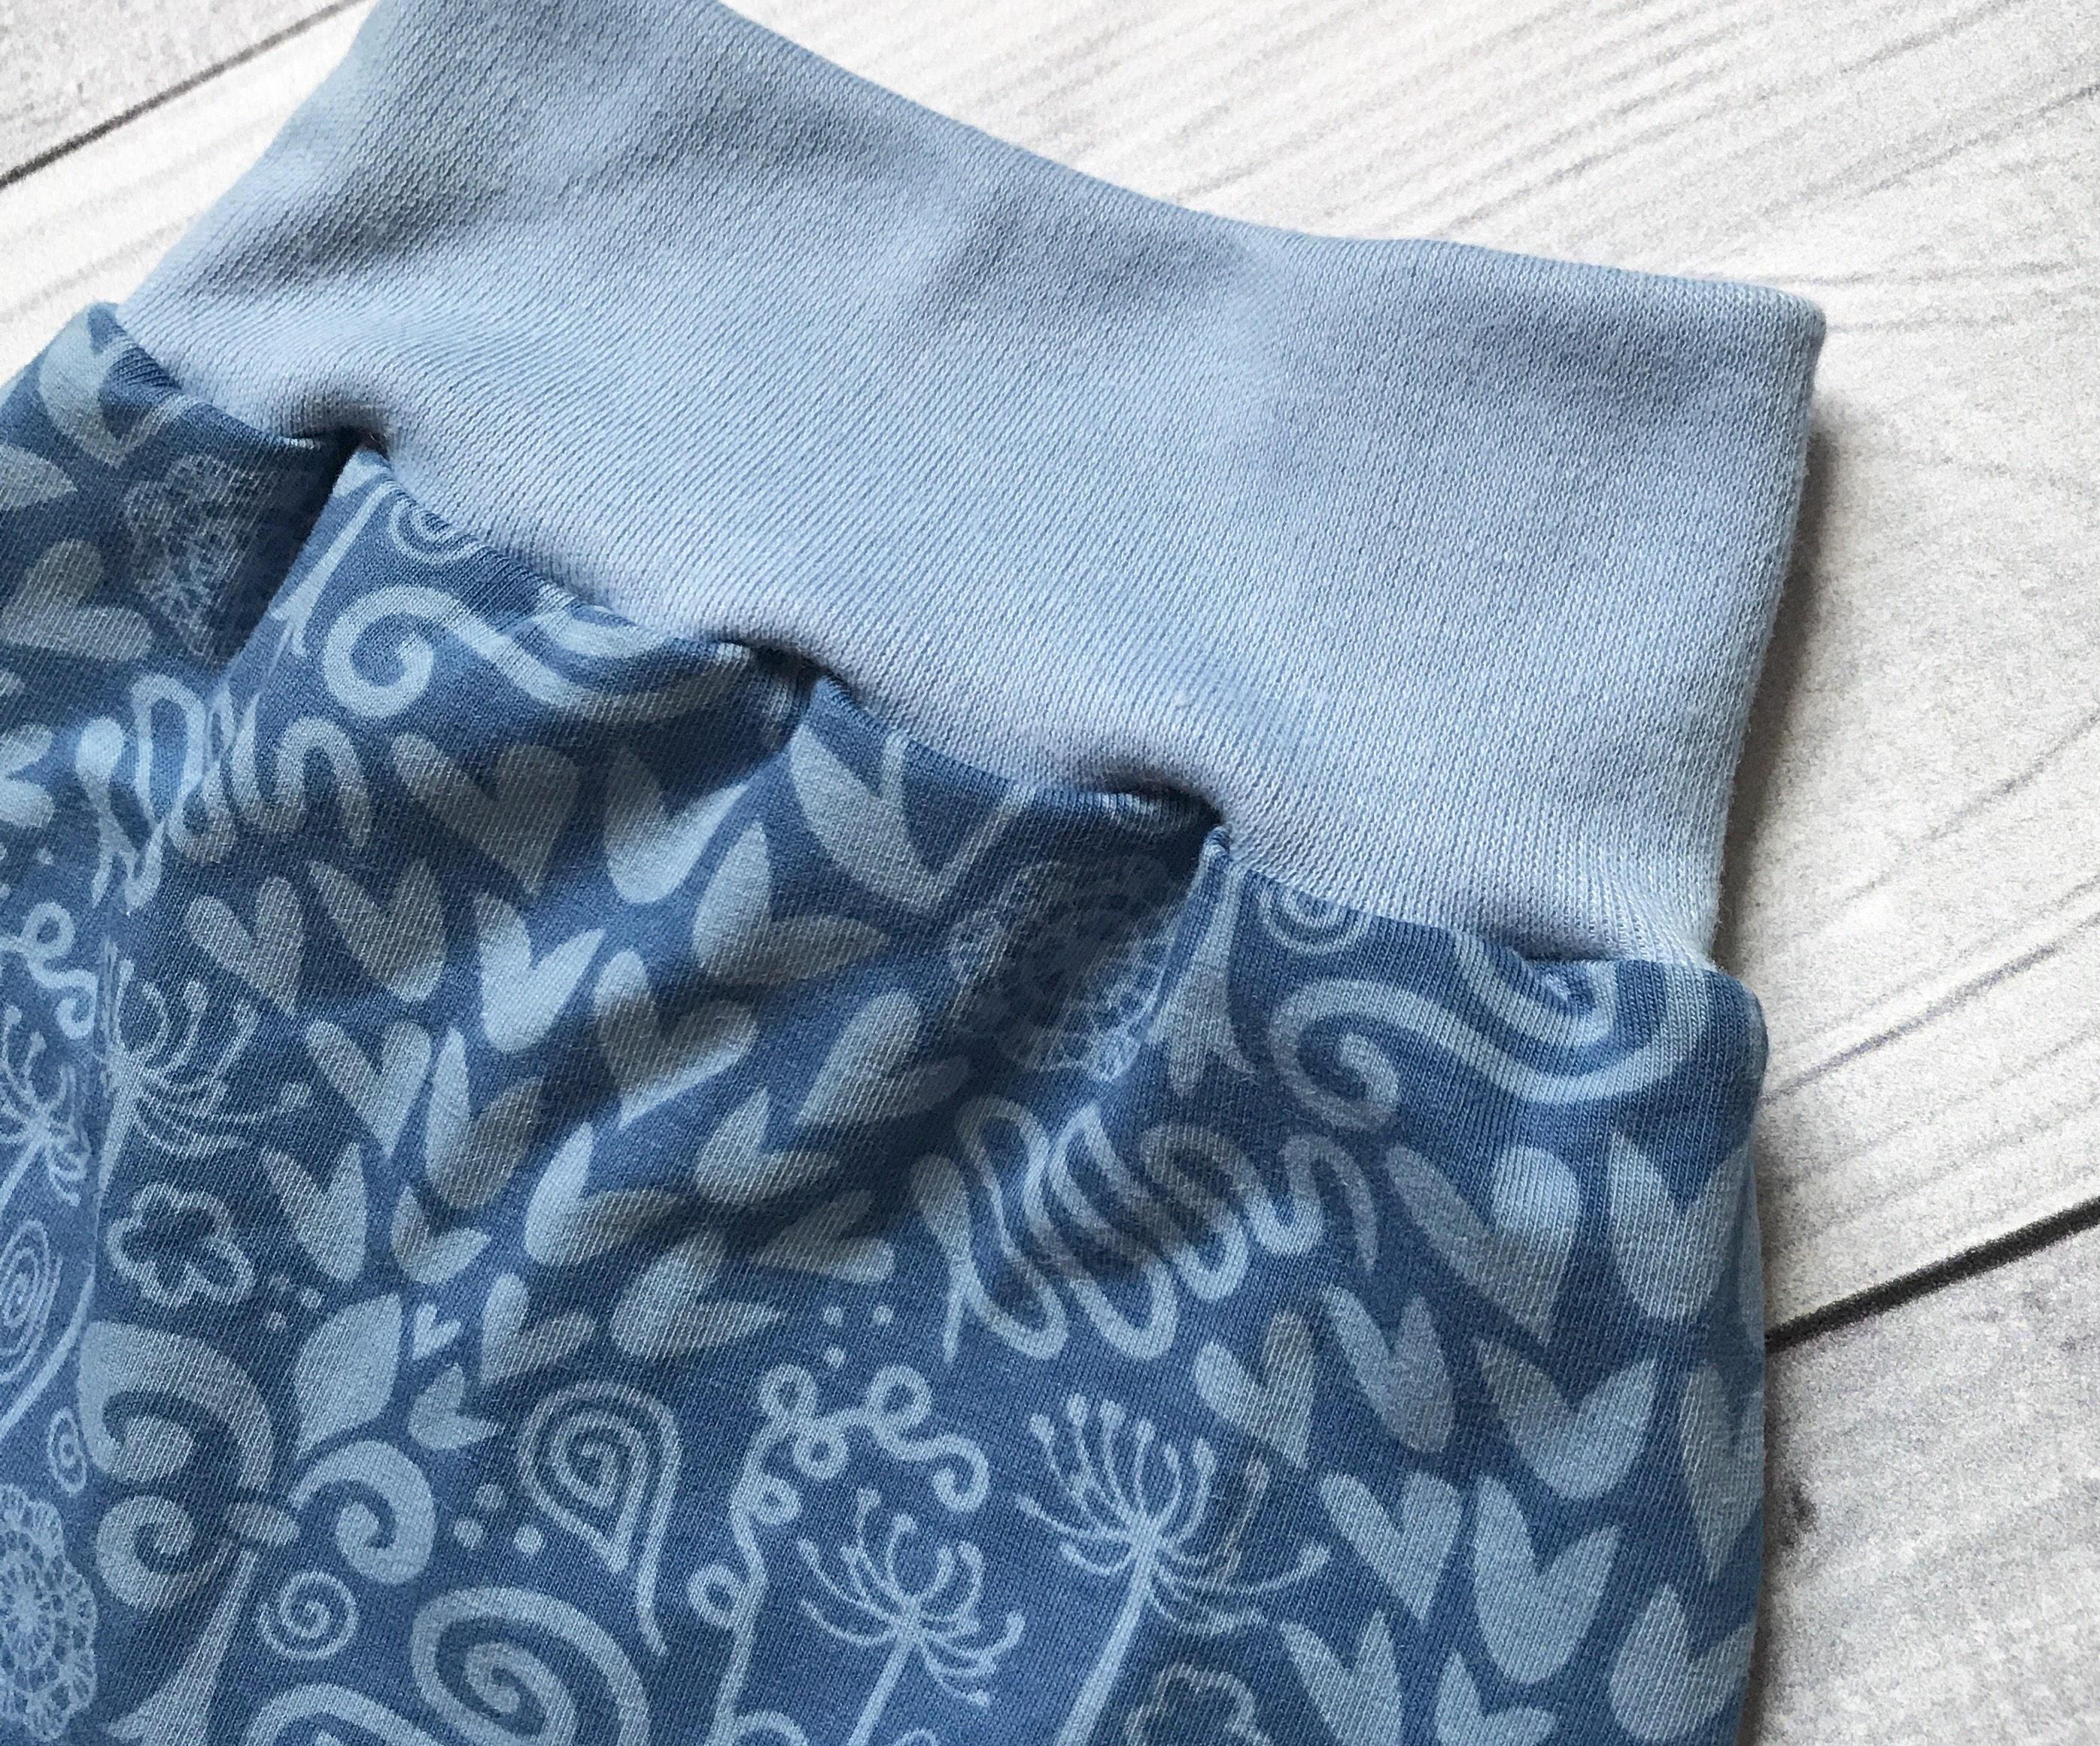 SALE Baby Flower Shorts Blue Baby Shorts Baby Summer Shorts